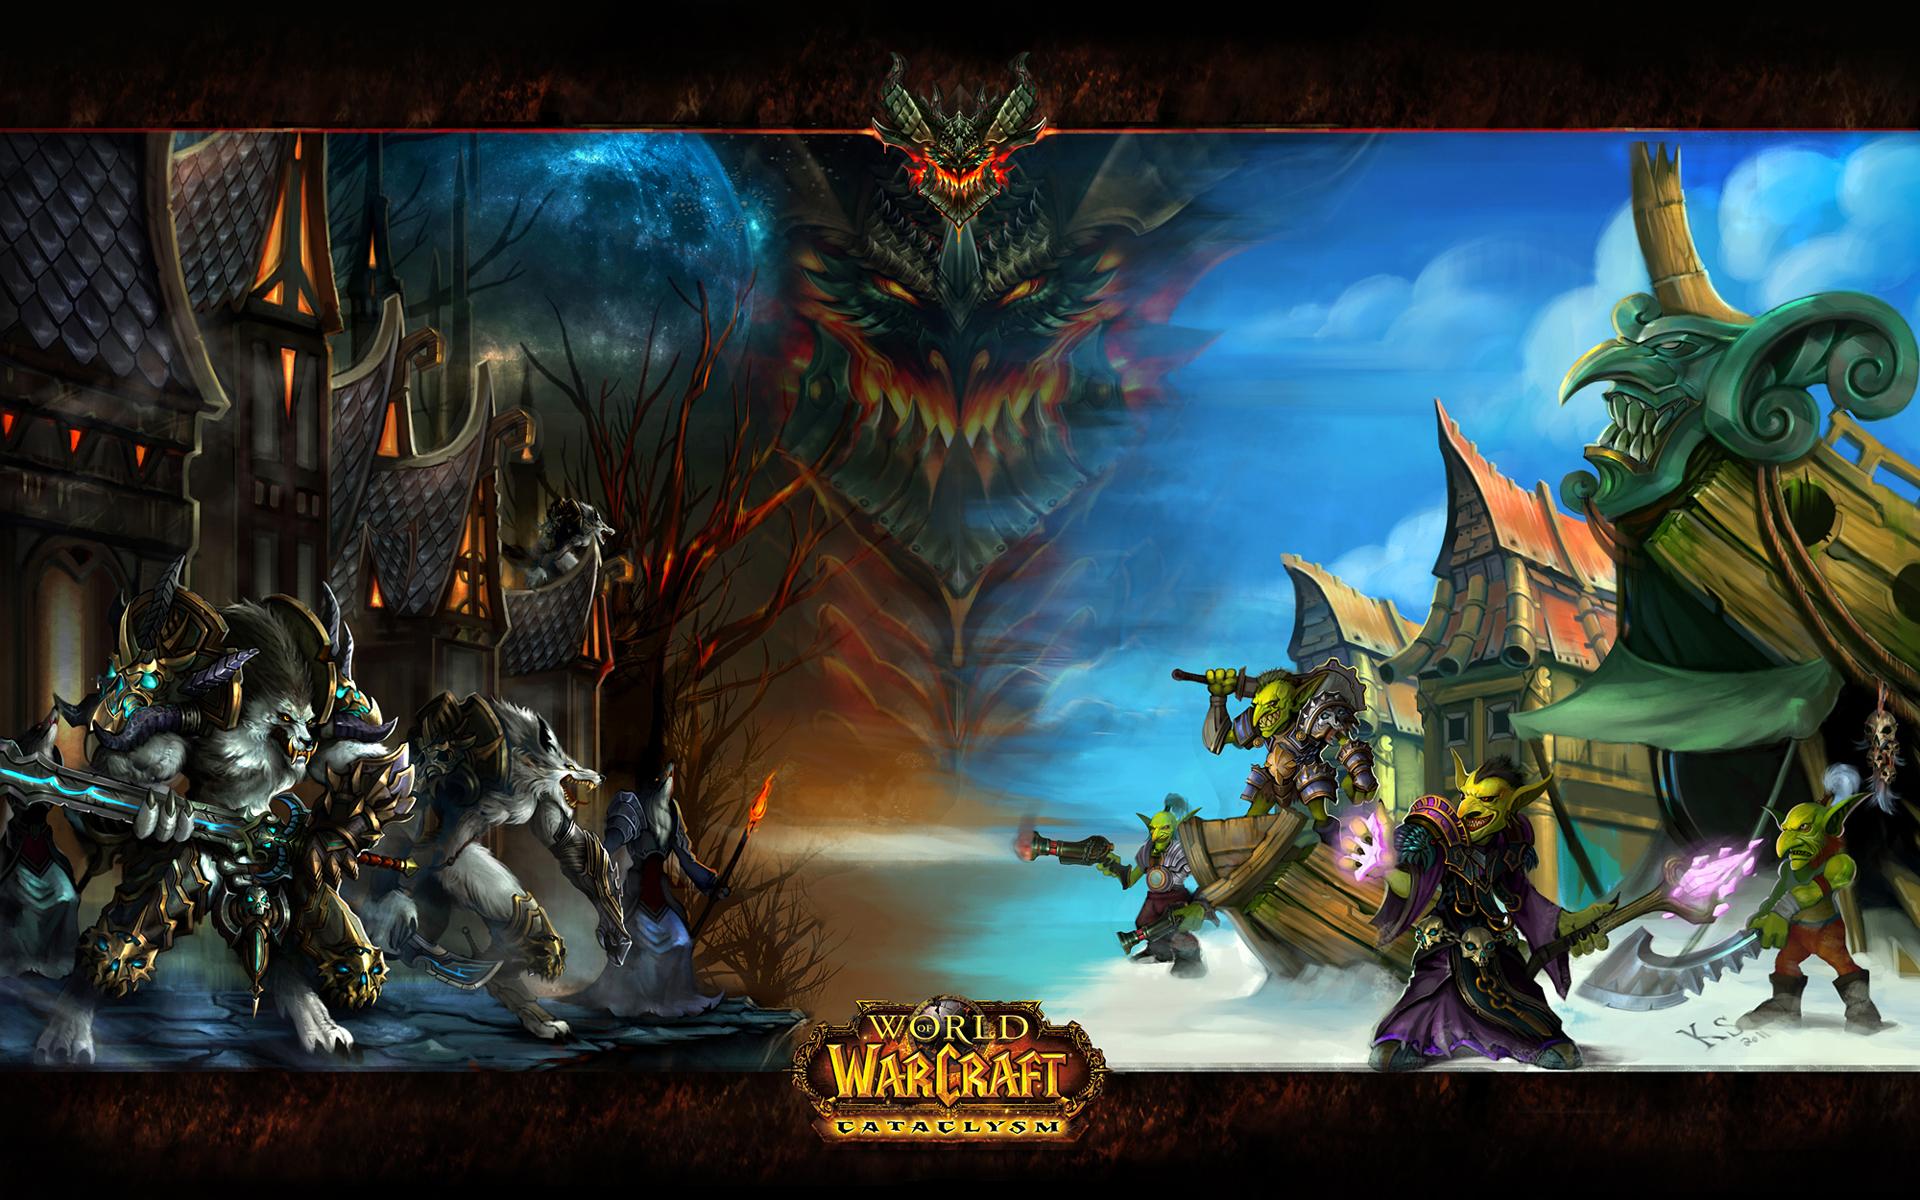 Wow Cataclysm Wallpaper - WallpaperSafari  World Of Warcraft Cataclysm Wallpapers